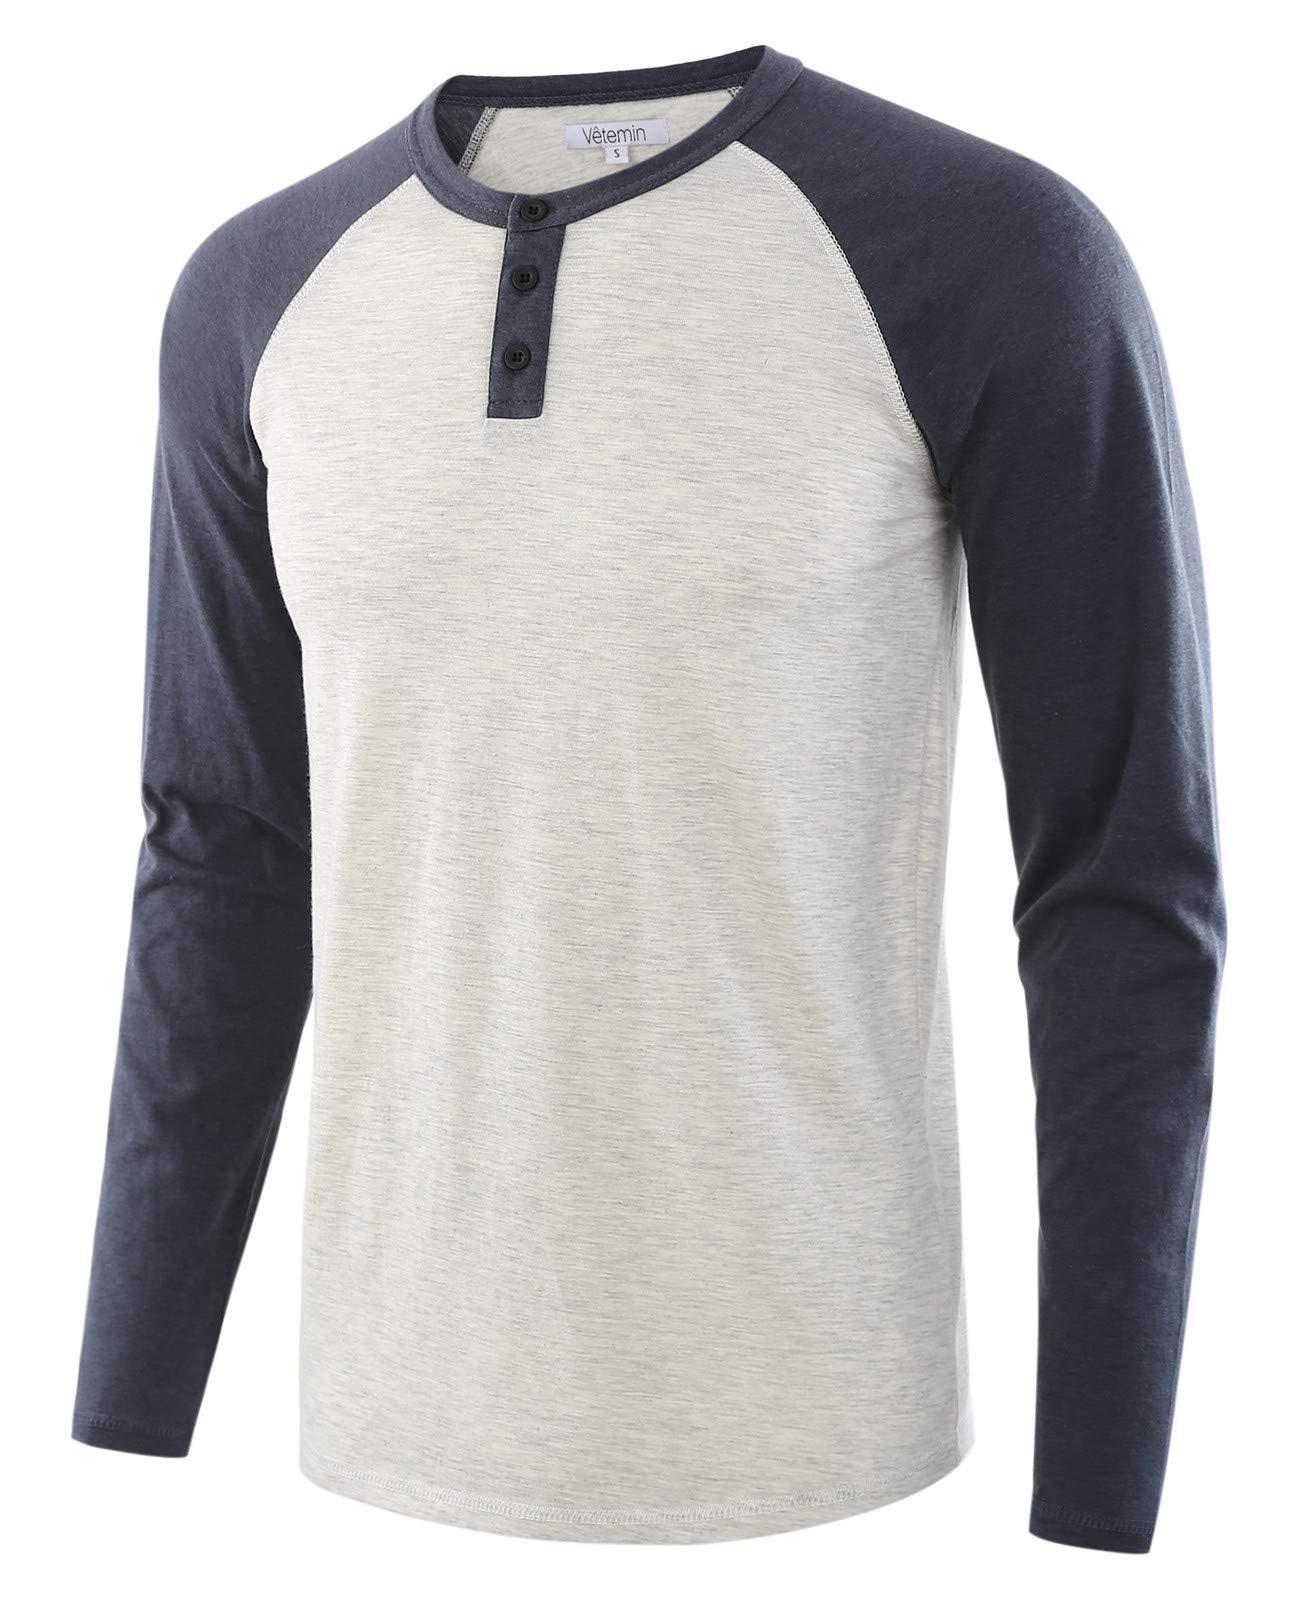 219699cb8a0b Vetemin Men's Casual Vintage Long Sleeve Raglan Henley Shirts Baseball T- Shirt H.Oatmeal/C.Blue S